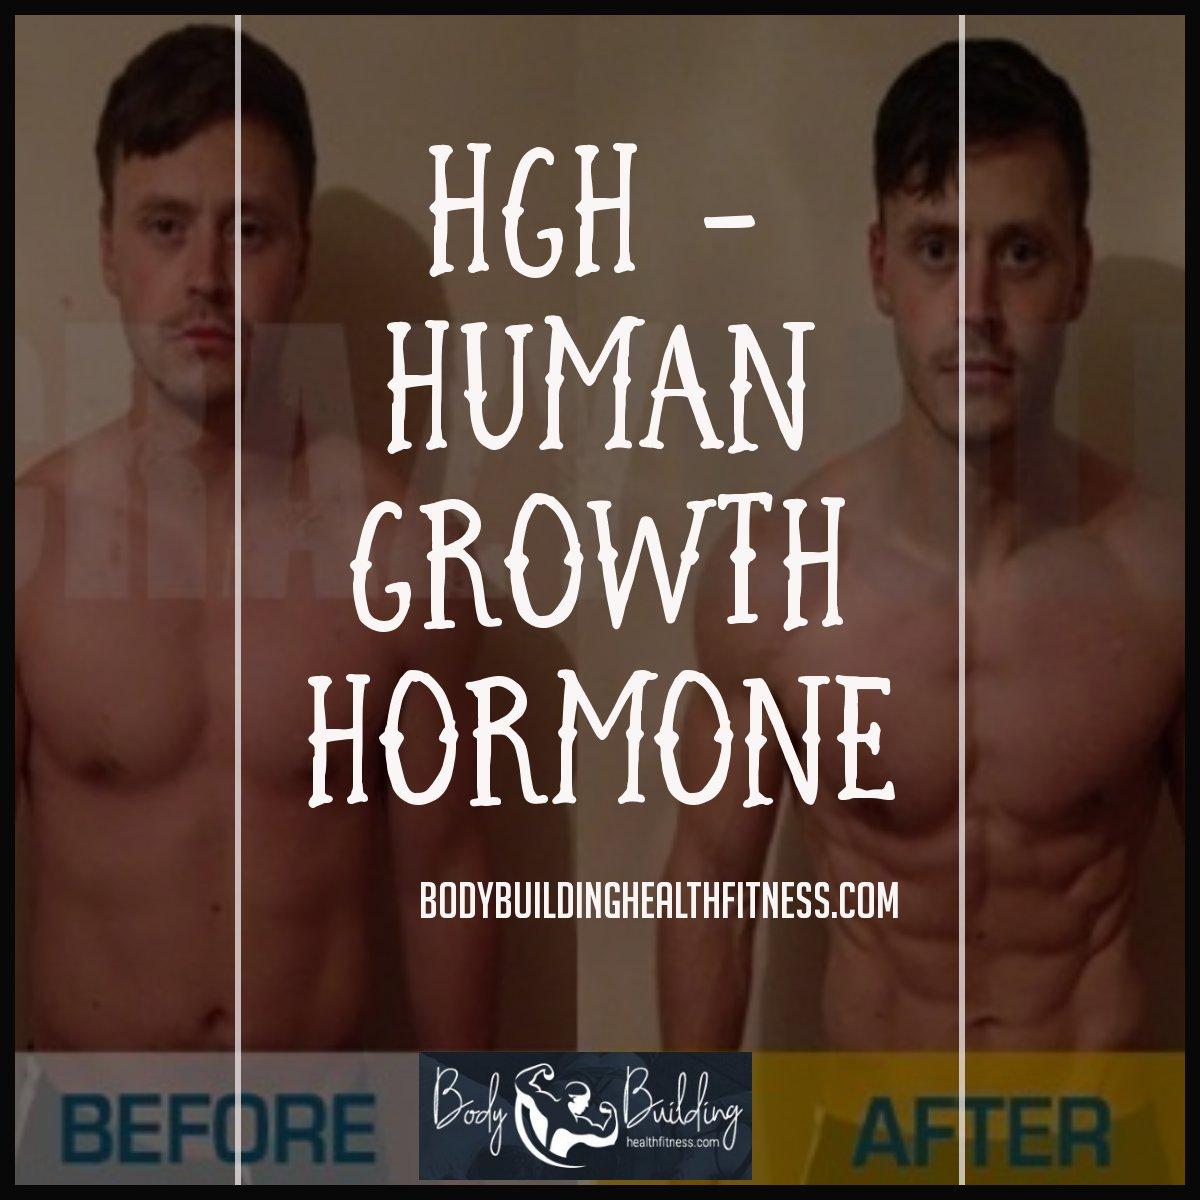 agapotabiblia: Bodybuilding Supplements Uk